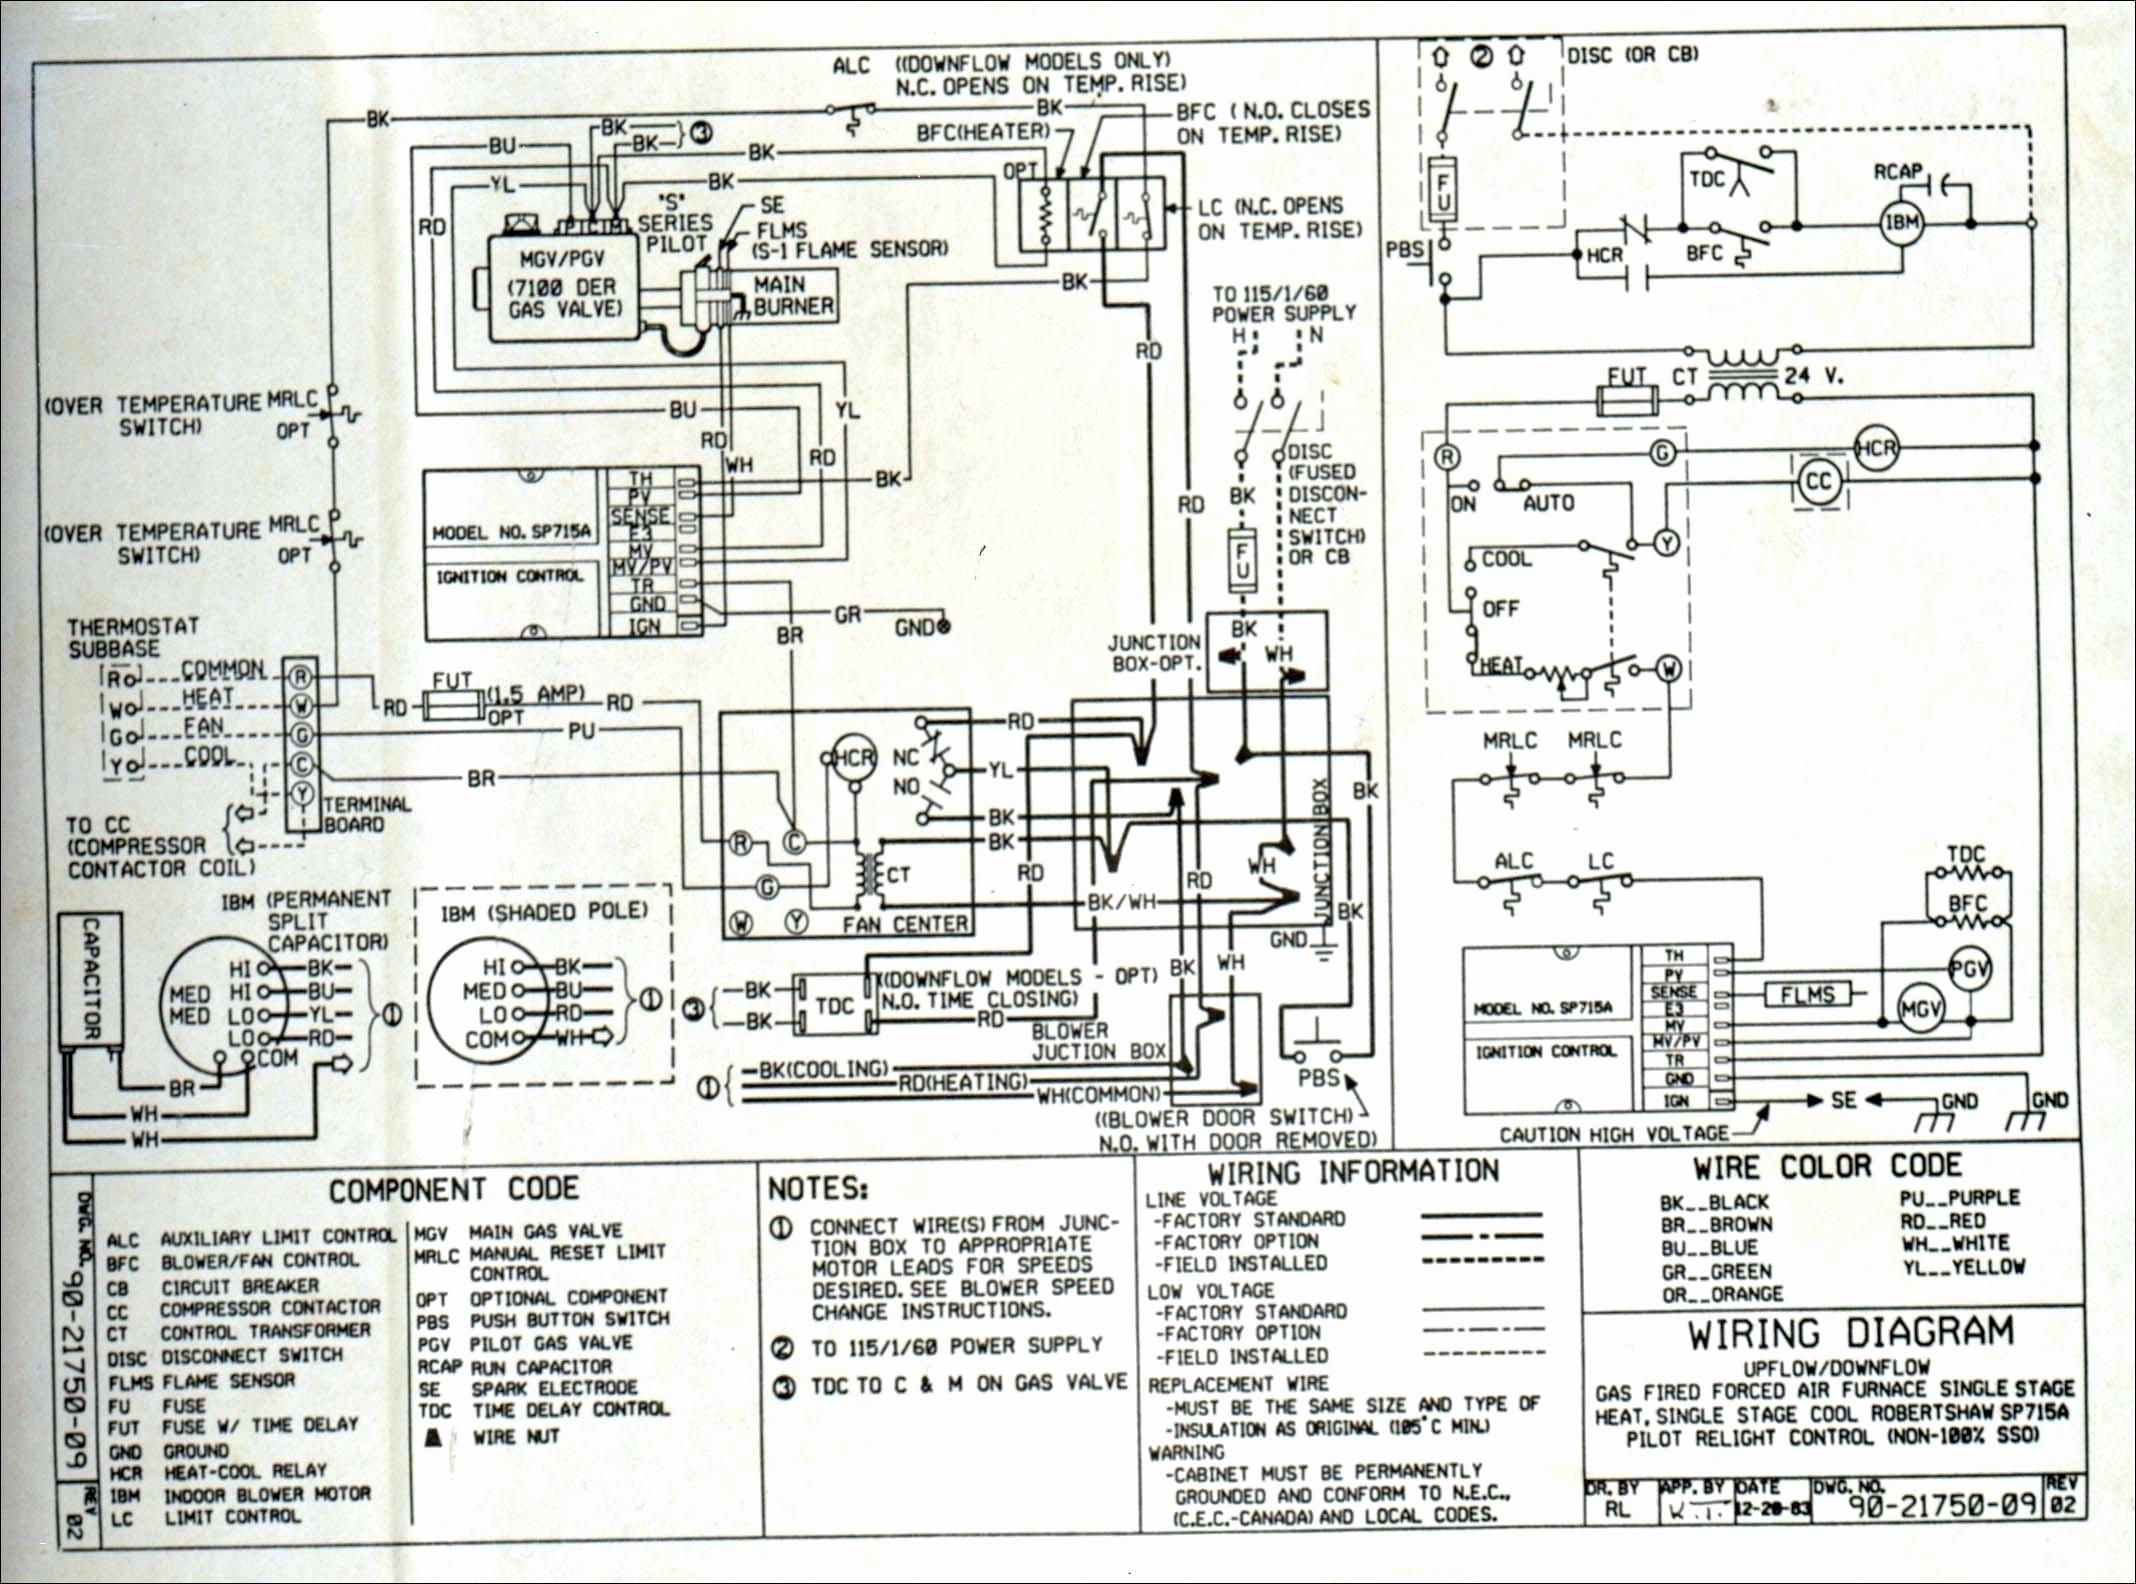 whirlpool rf362lxsq wiring schematic wiring schematic Whirlpool Rf362lxsq Wiring Schematic